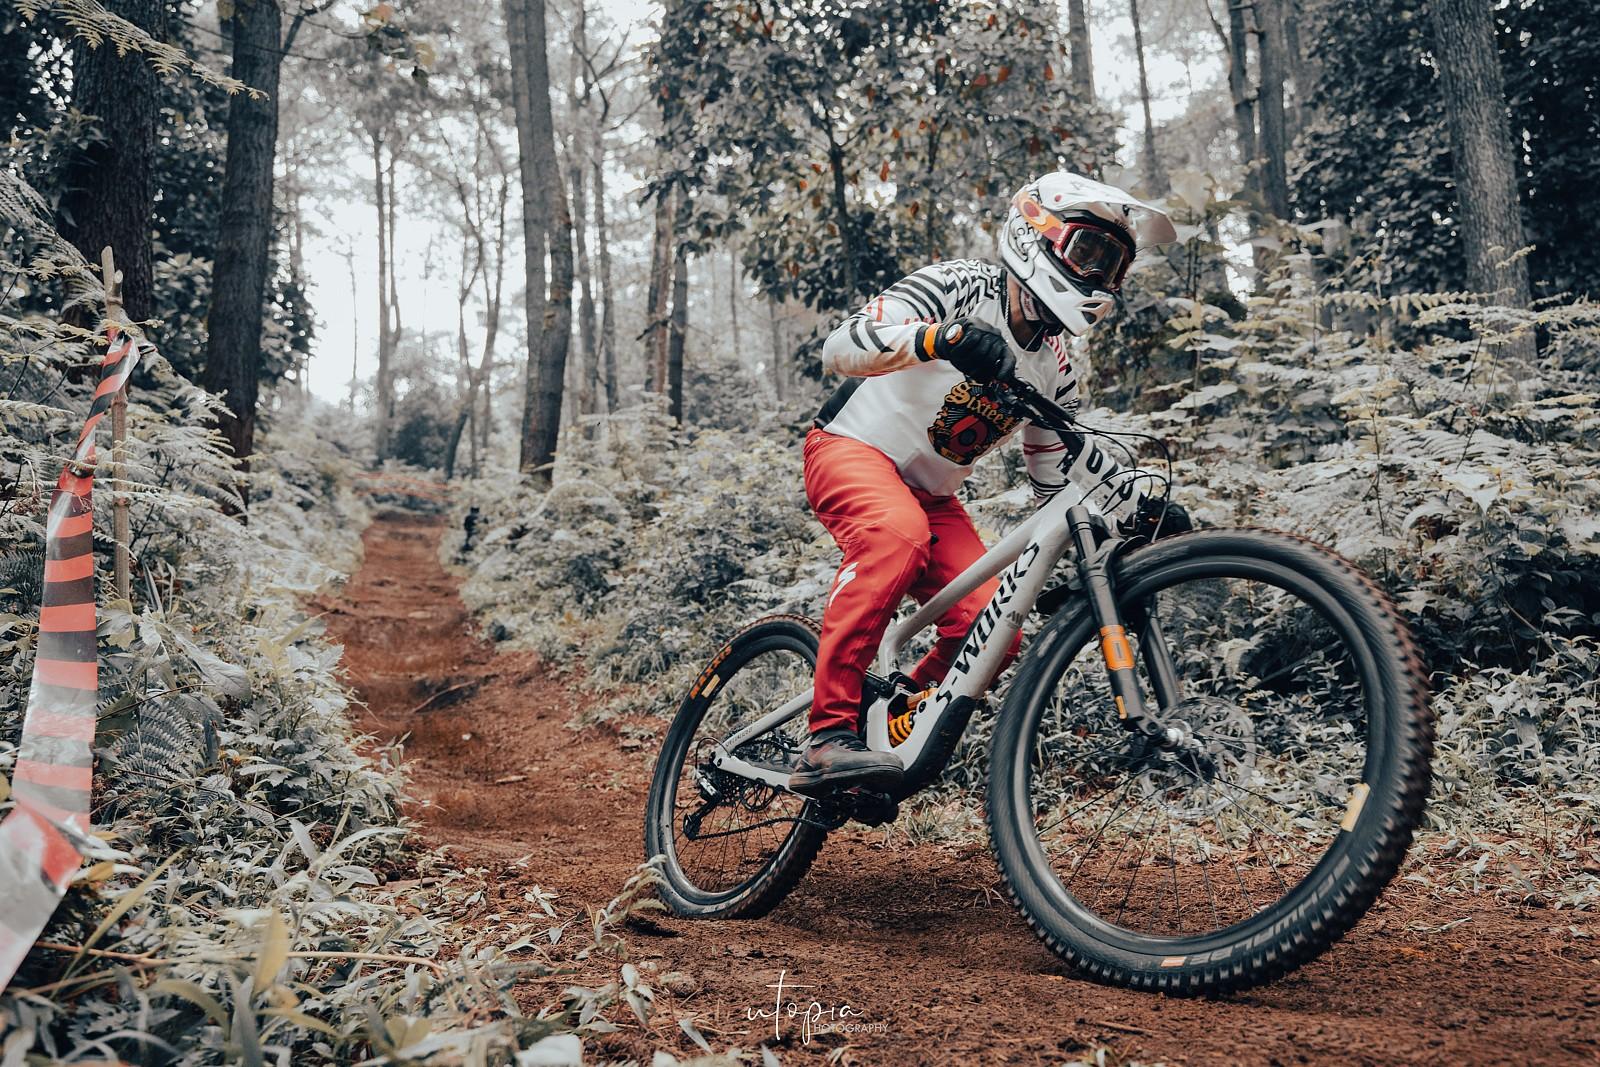 The Vro - utopiaarch - Mountain Biking Pictures - Vital MTB